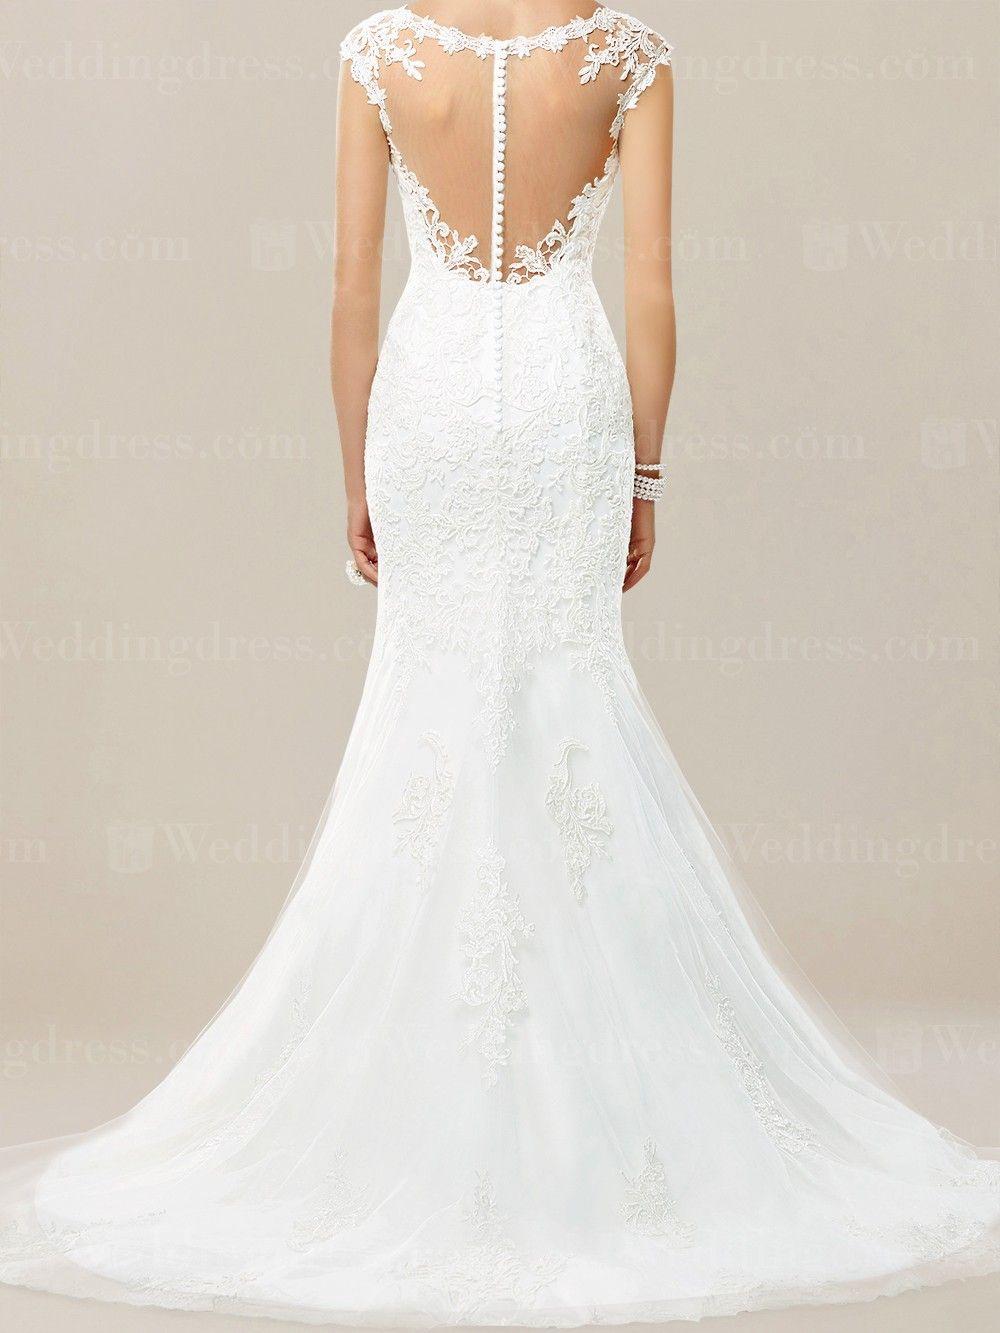 White mermaid wedding dress  Lace Mermaid Wedding Dress ME  Gorgeous dresses  Pinterest